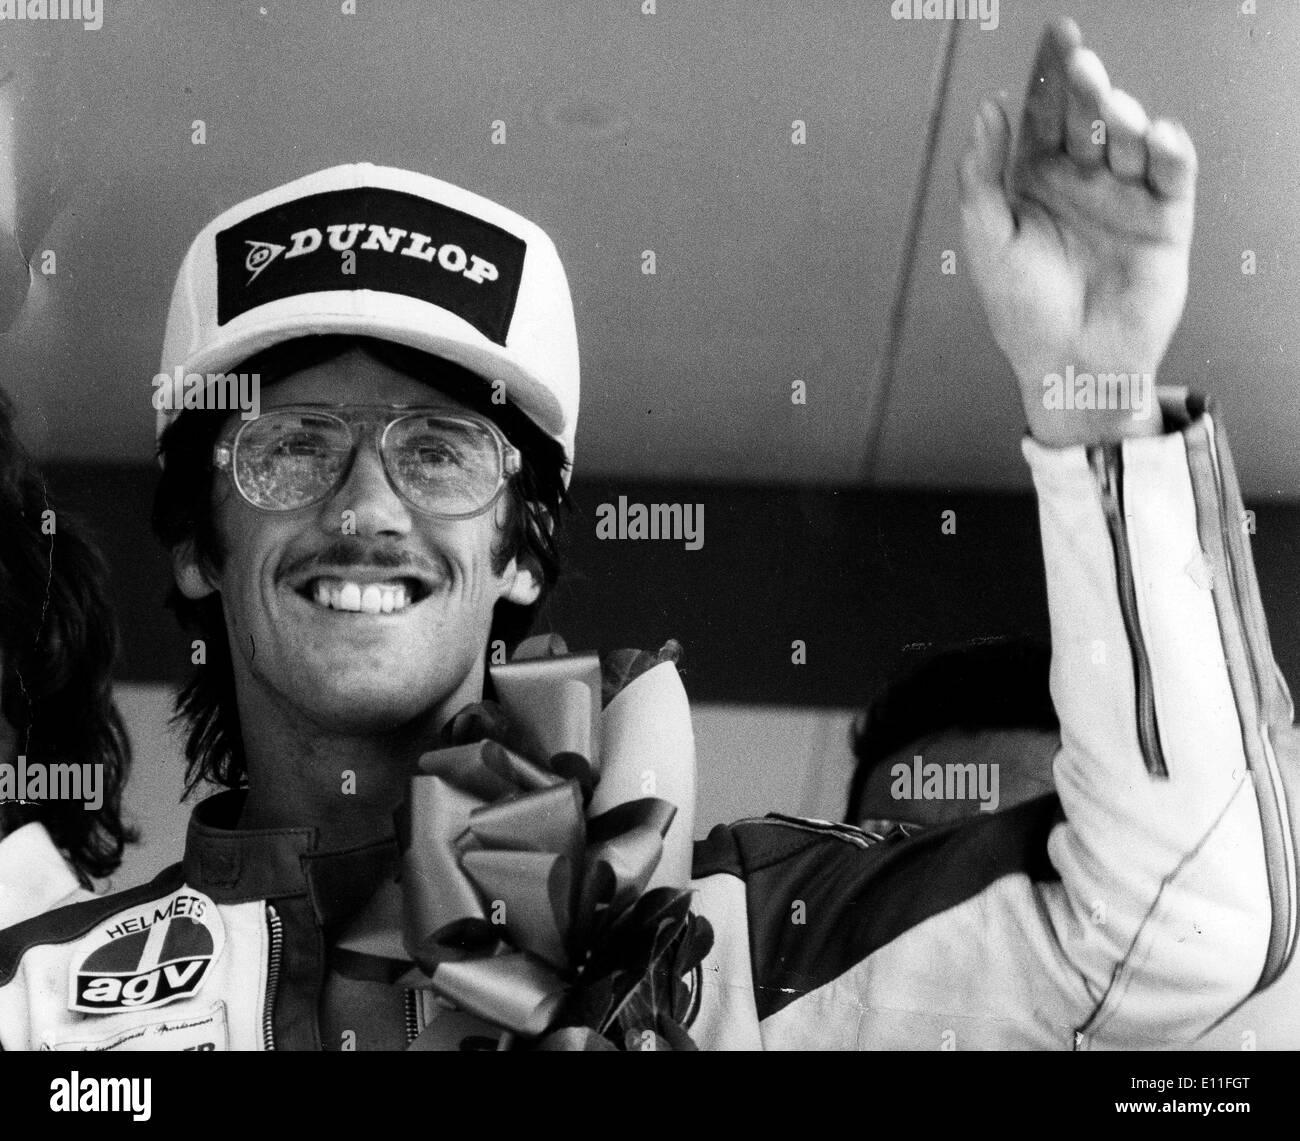 Jul 12, 1977; Kent, England, UK; Motorcycle racer STEVE BAKER gives a victory wave after winning the 750 World Championship race at Brands Hatch. - Stock Image